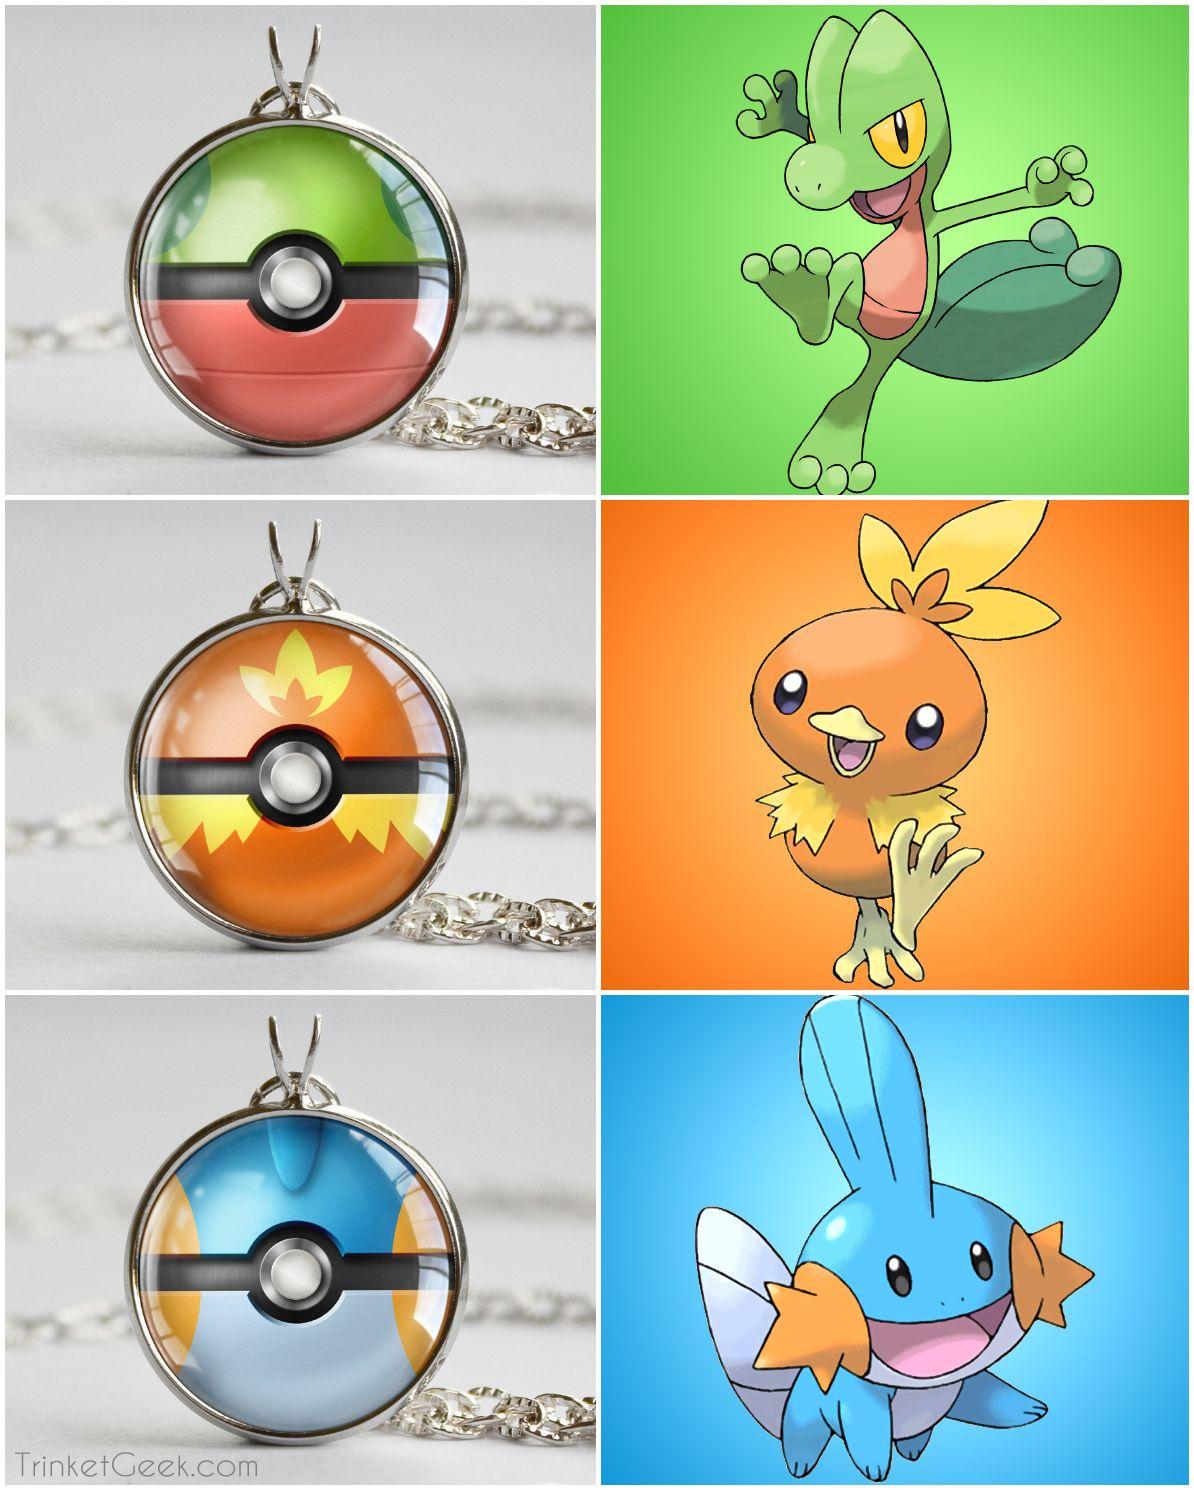 treecko pokemon go